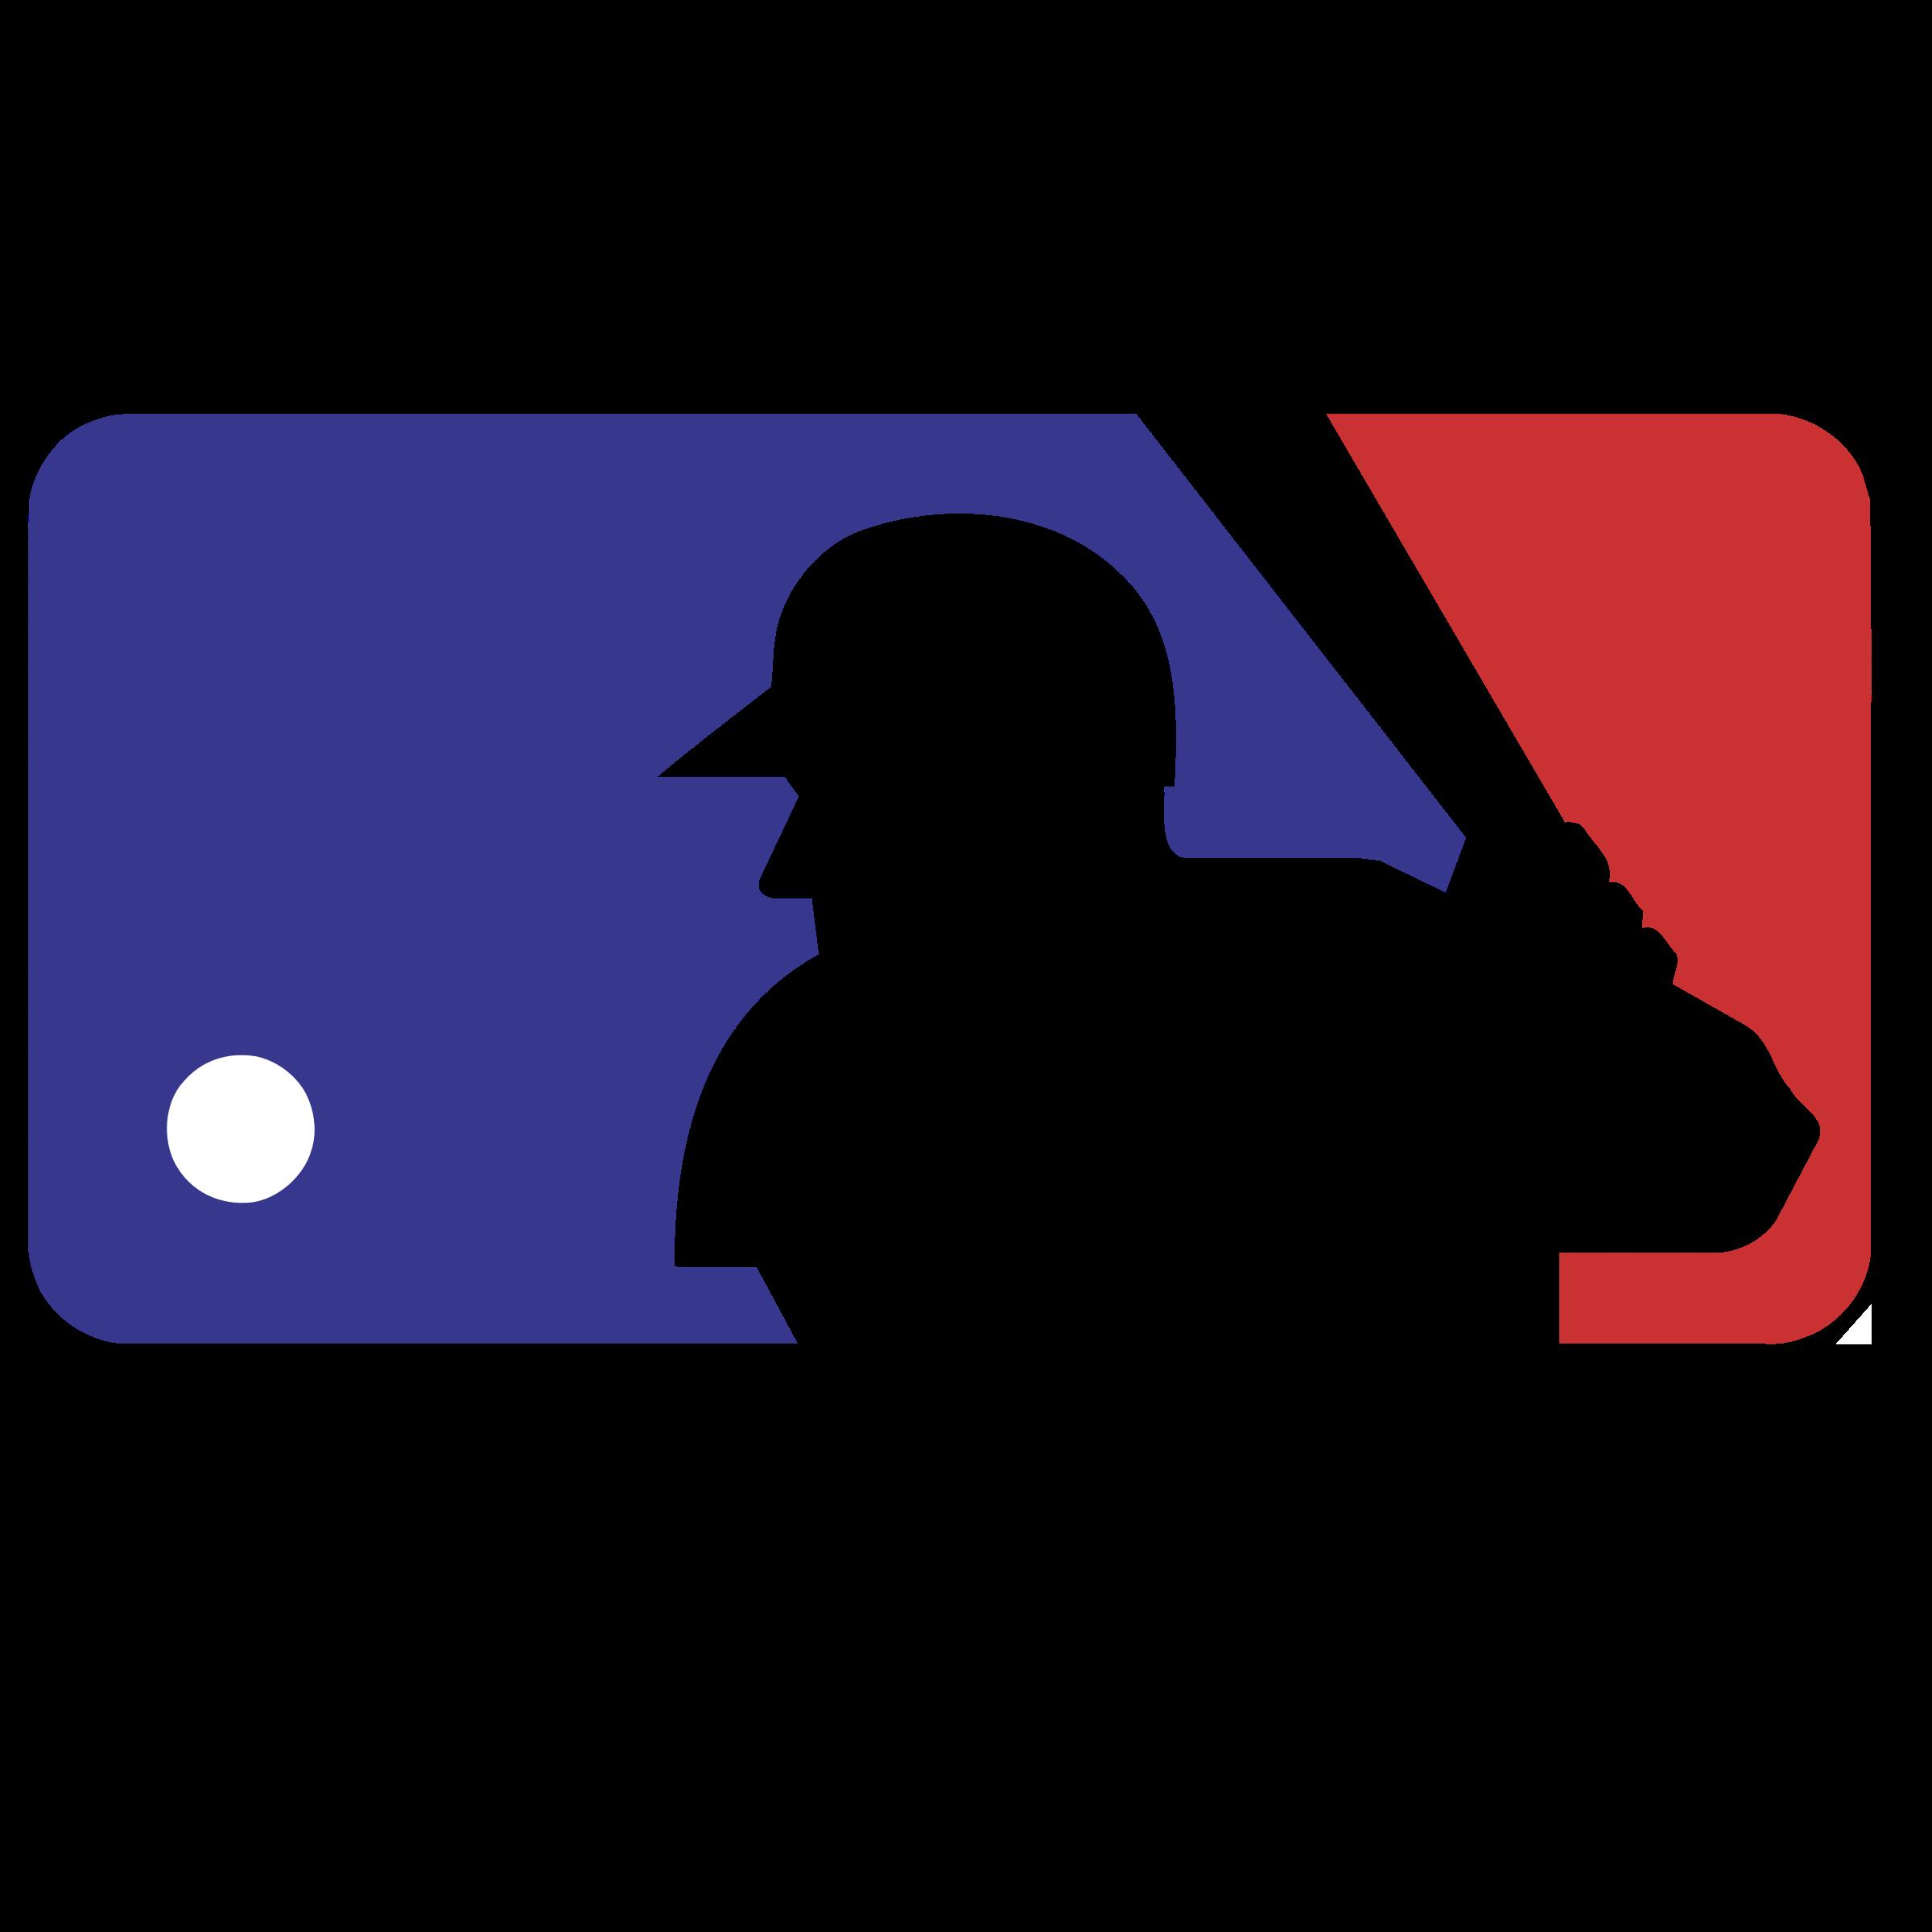 MLG Logo Without Name PNG Image